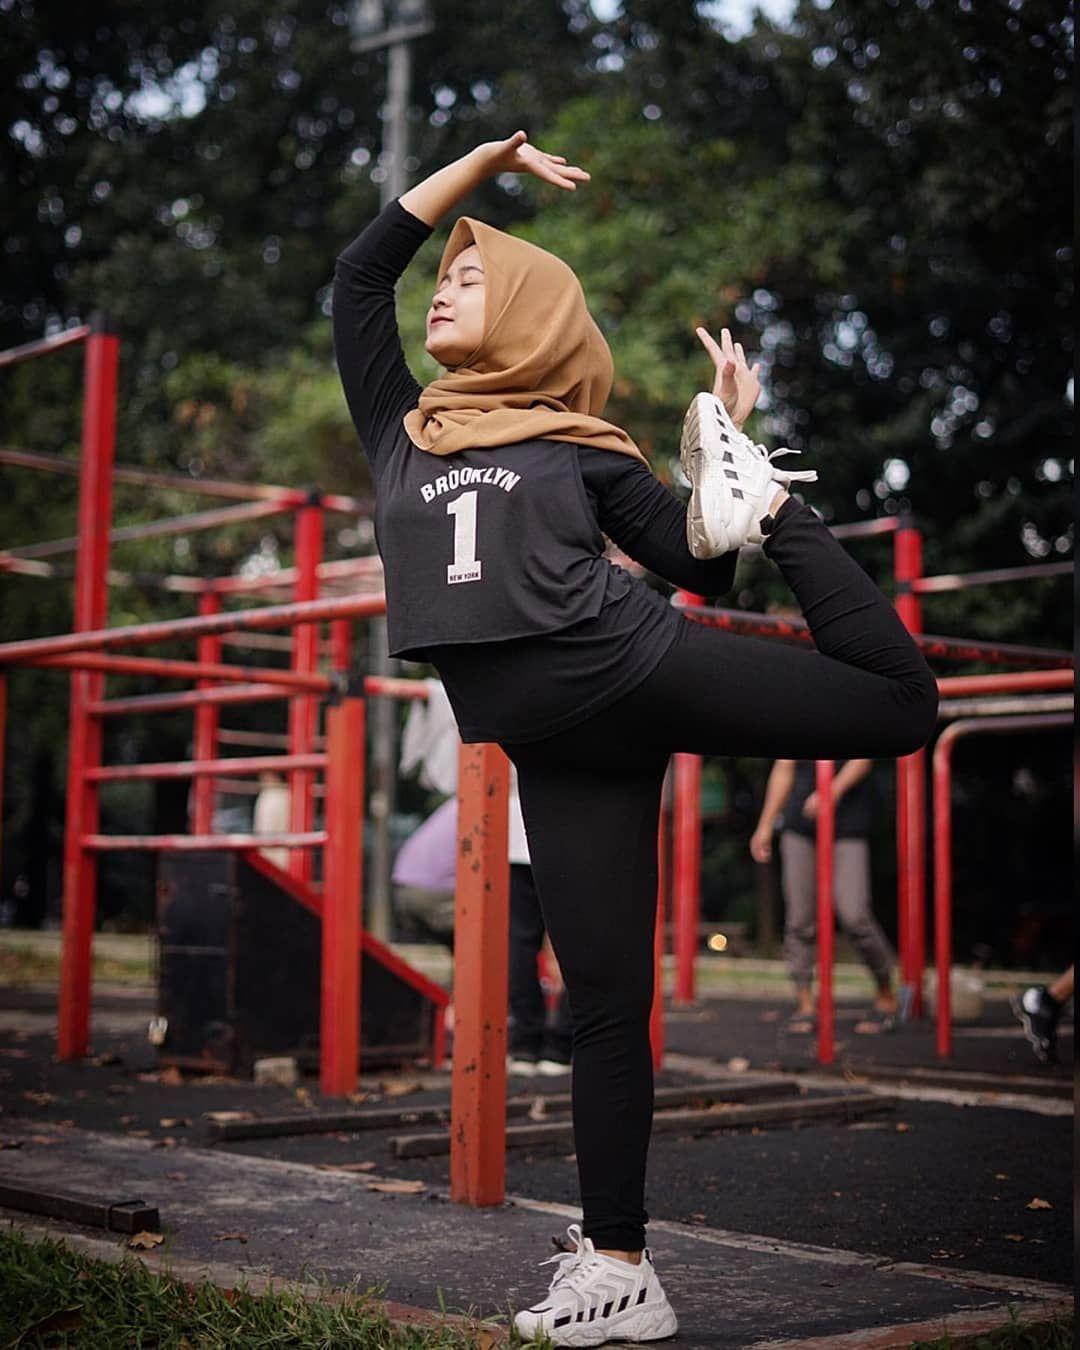 Hijab Cantik Indonesia Di Instagram From Risasabilla Ceritanya Pemanasan Ala Ala Sebelum Olahraga Jangan Lupa Di Like Gaya Hijab Olahraga Mode Wanita